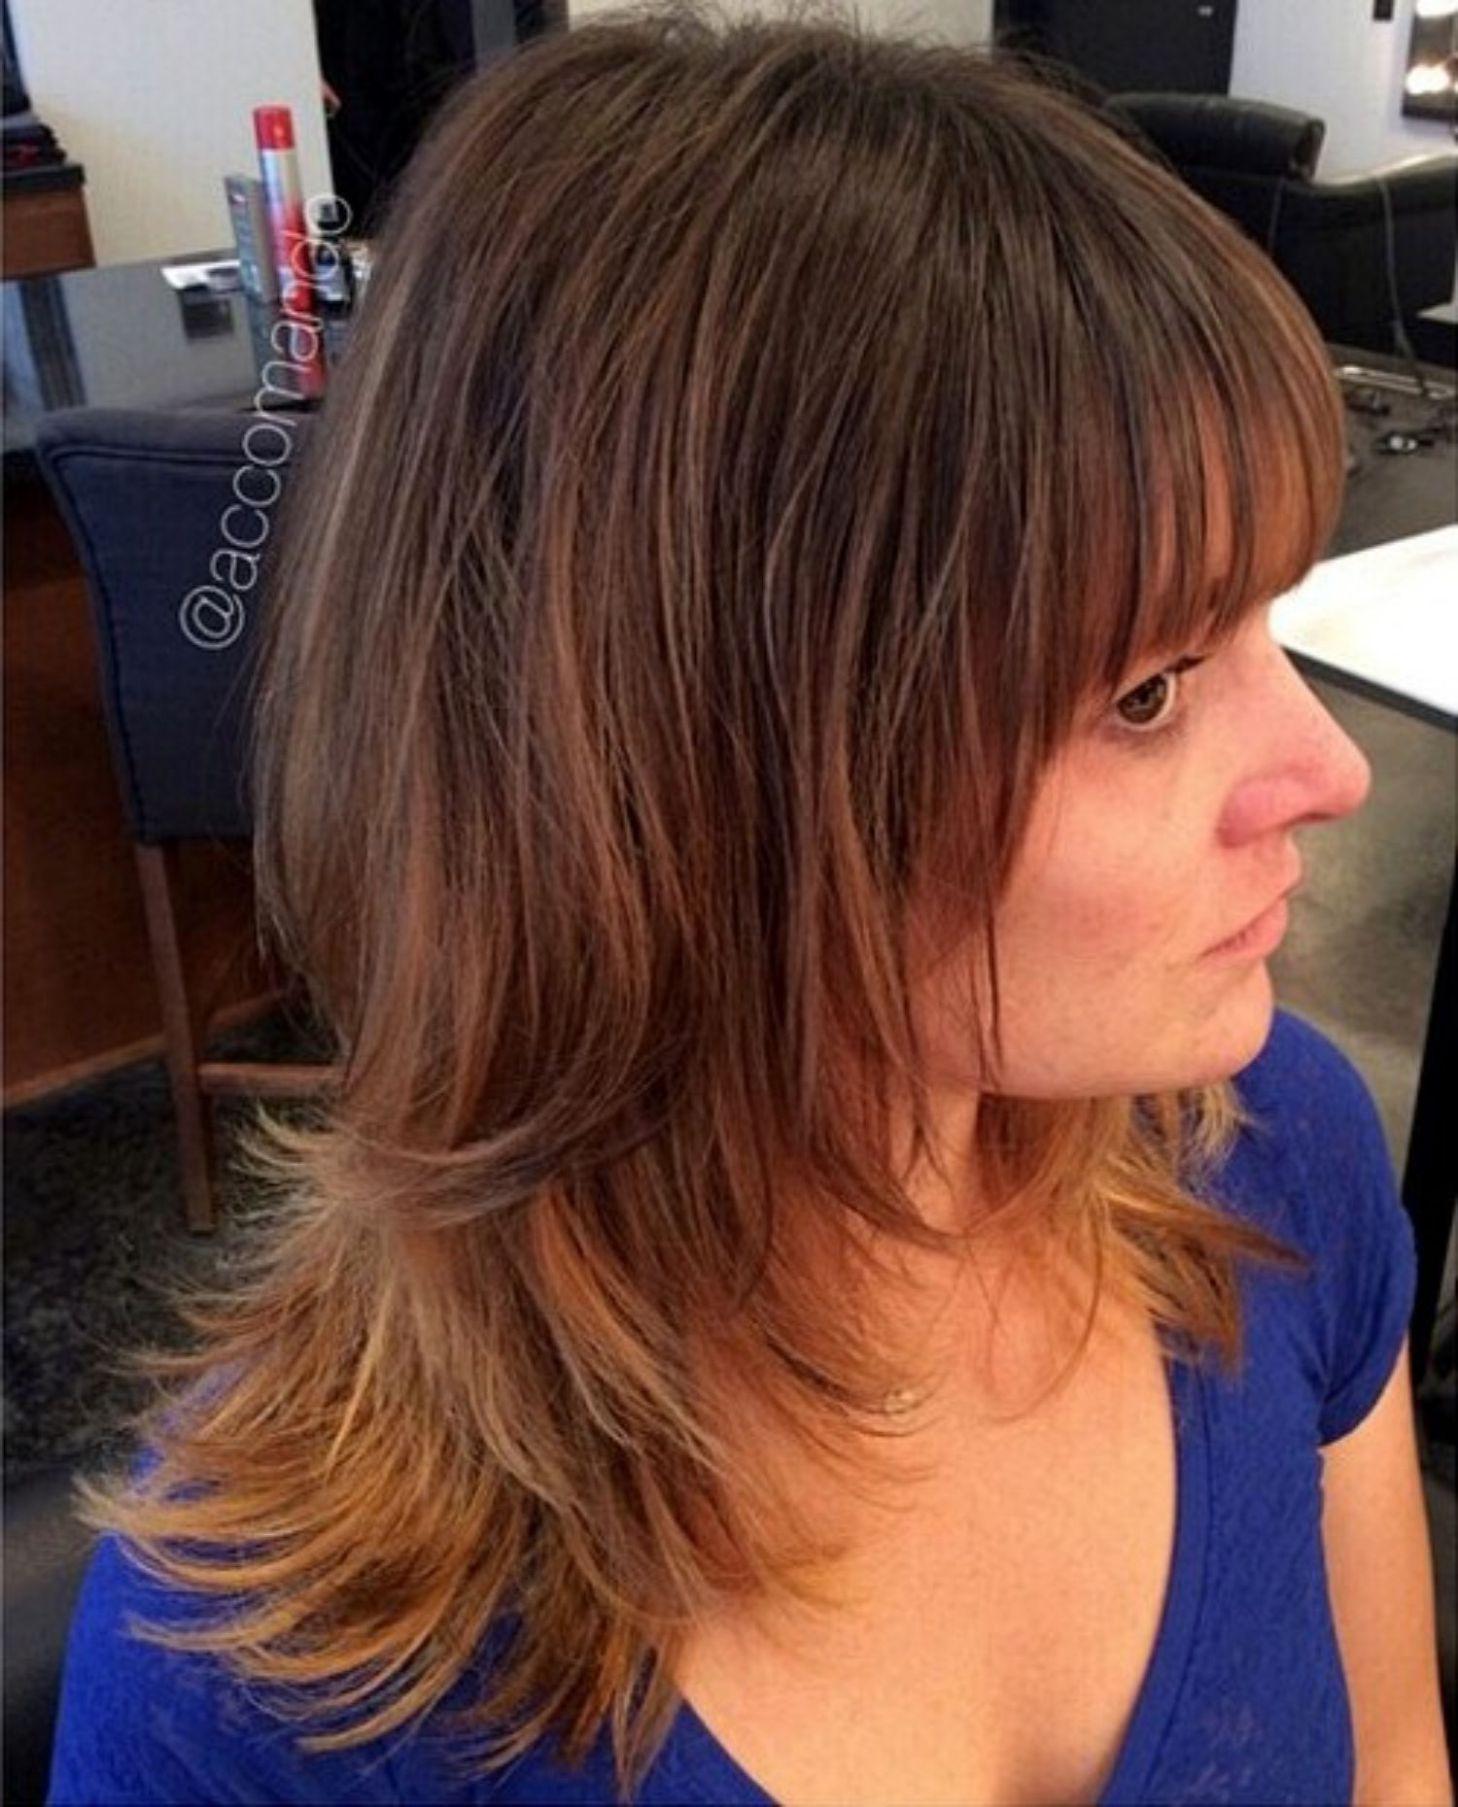 50 Most Universal Modern Shag Haircut Solutions | Hair and ...